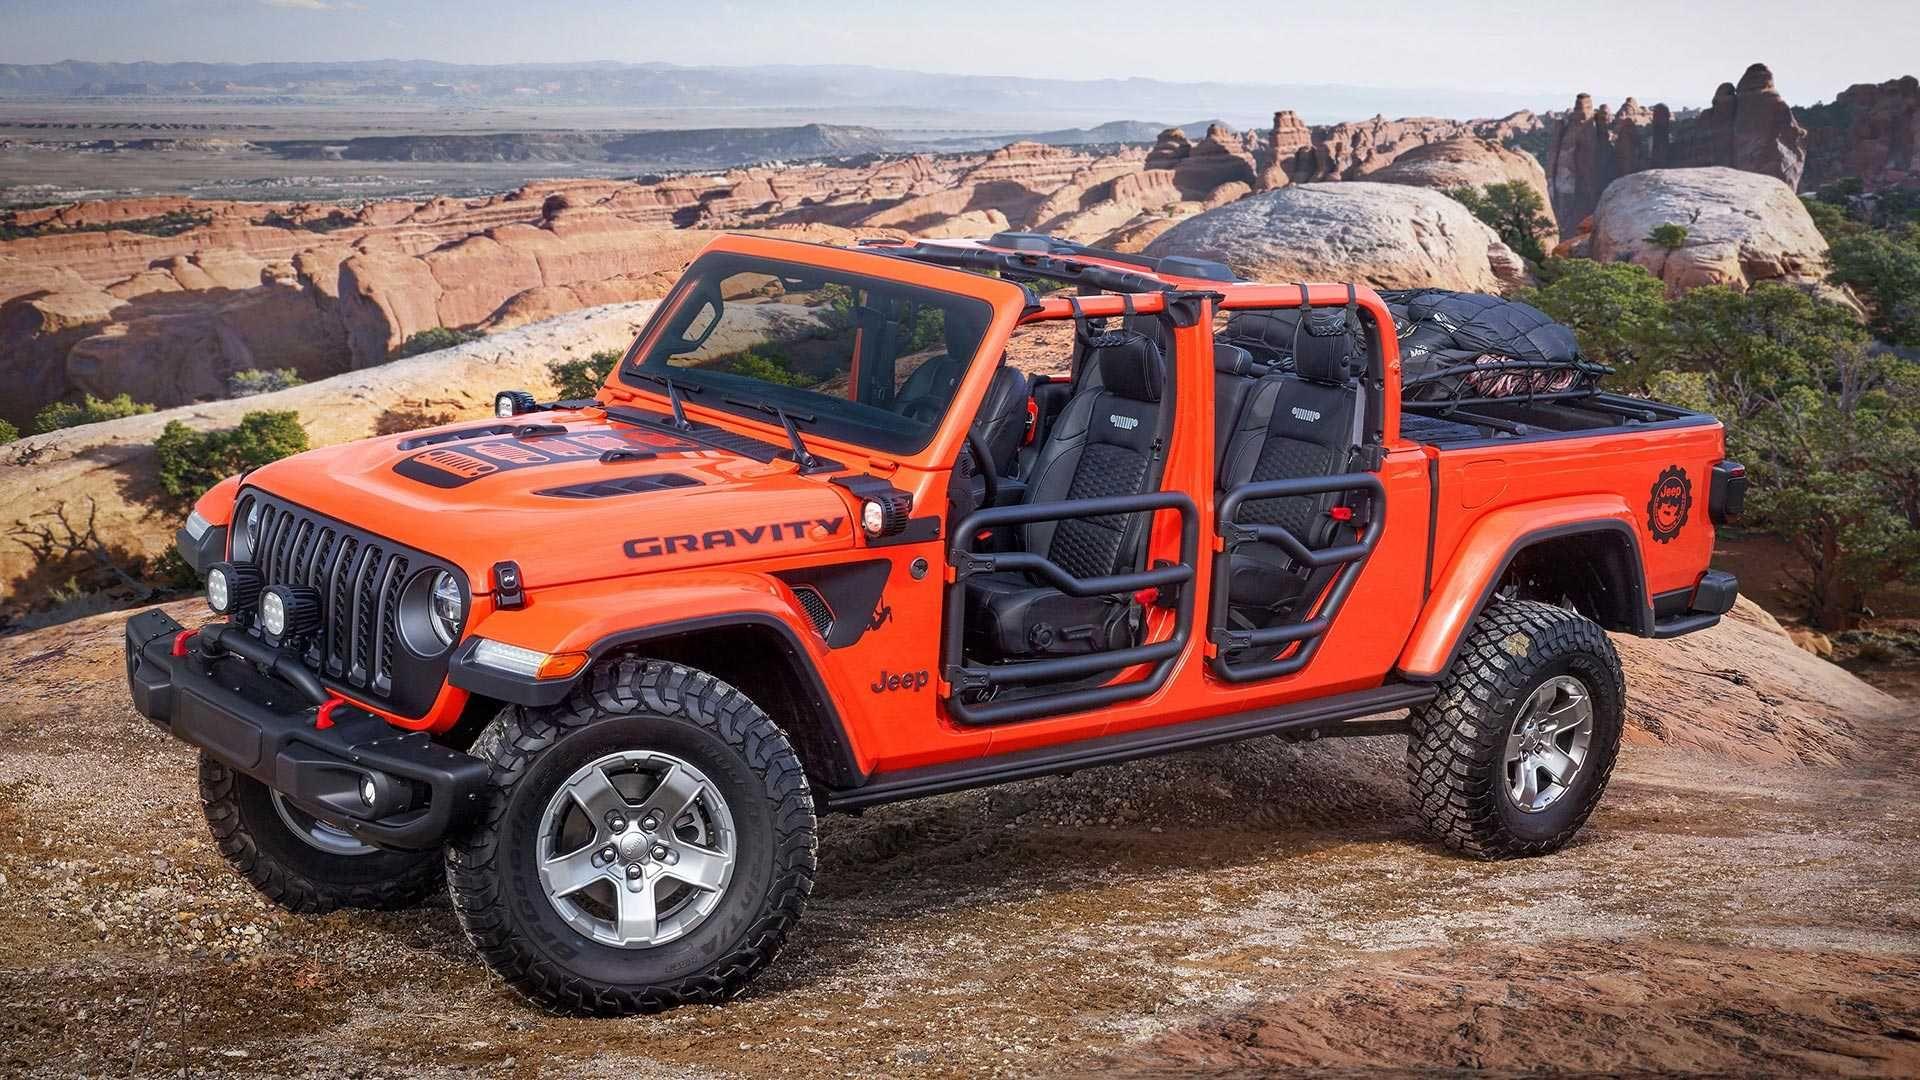 2019 Jeep Gladiator Gravity Jeep Gladiator Easter Jeep Safari Jeep Truck